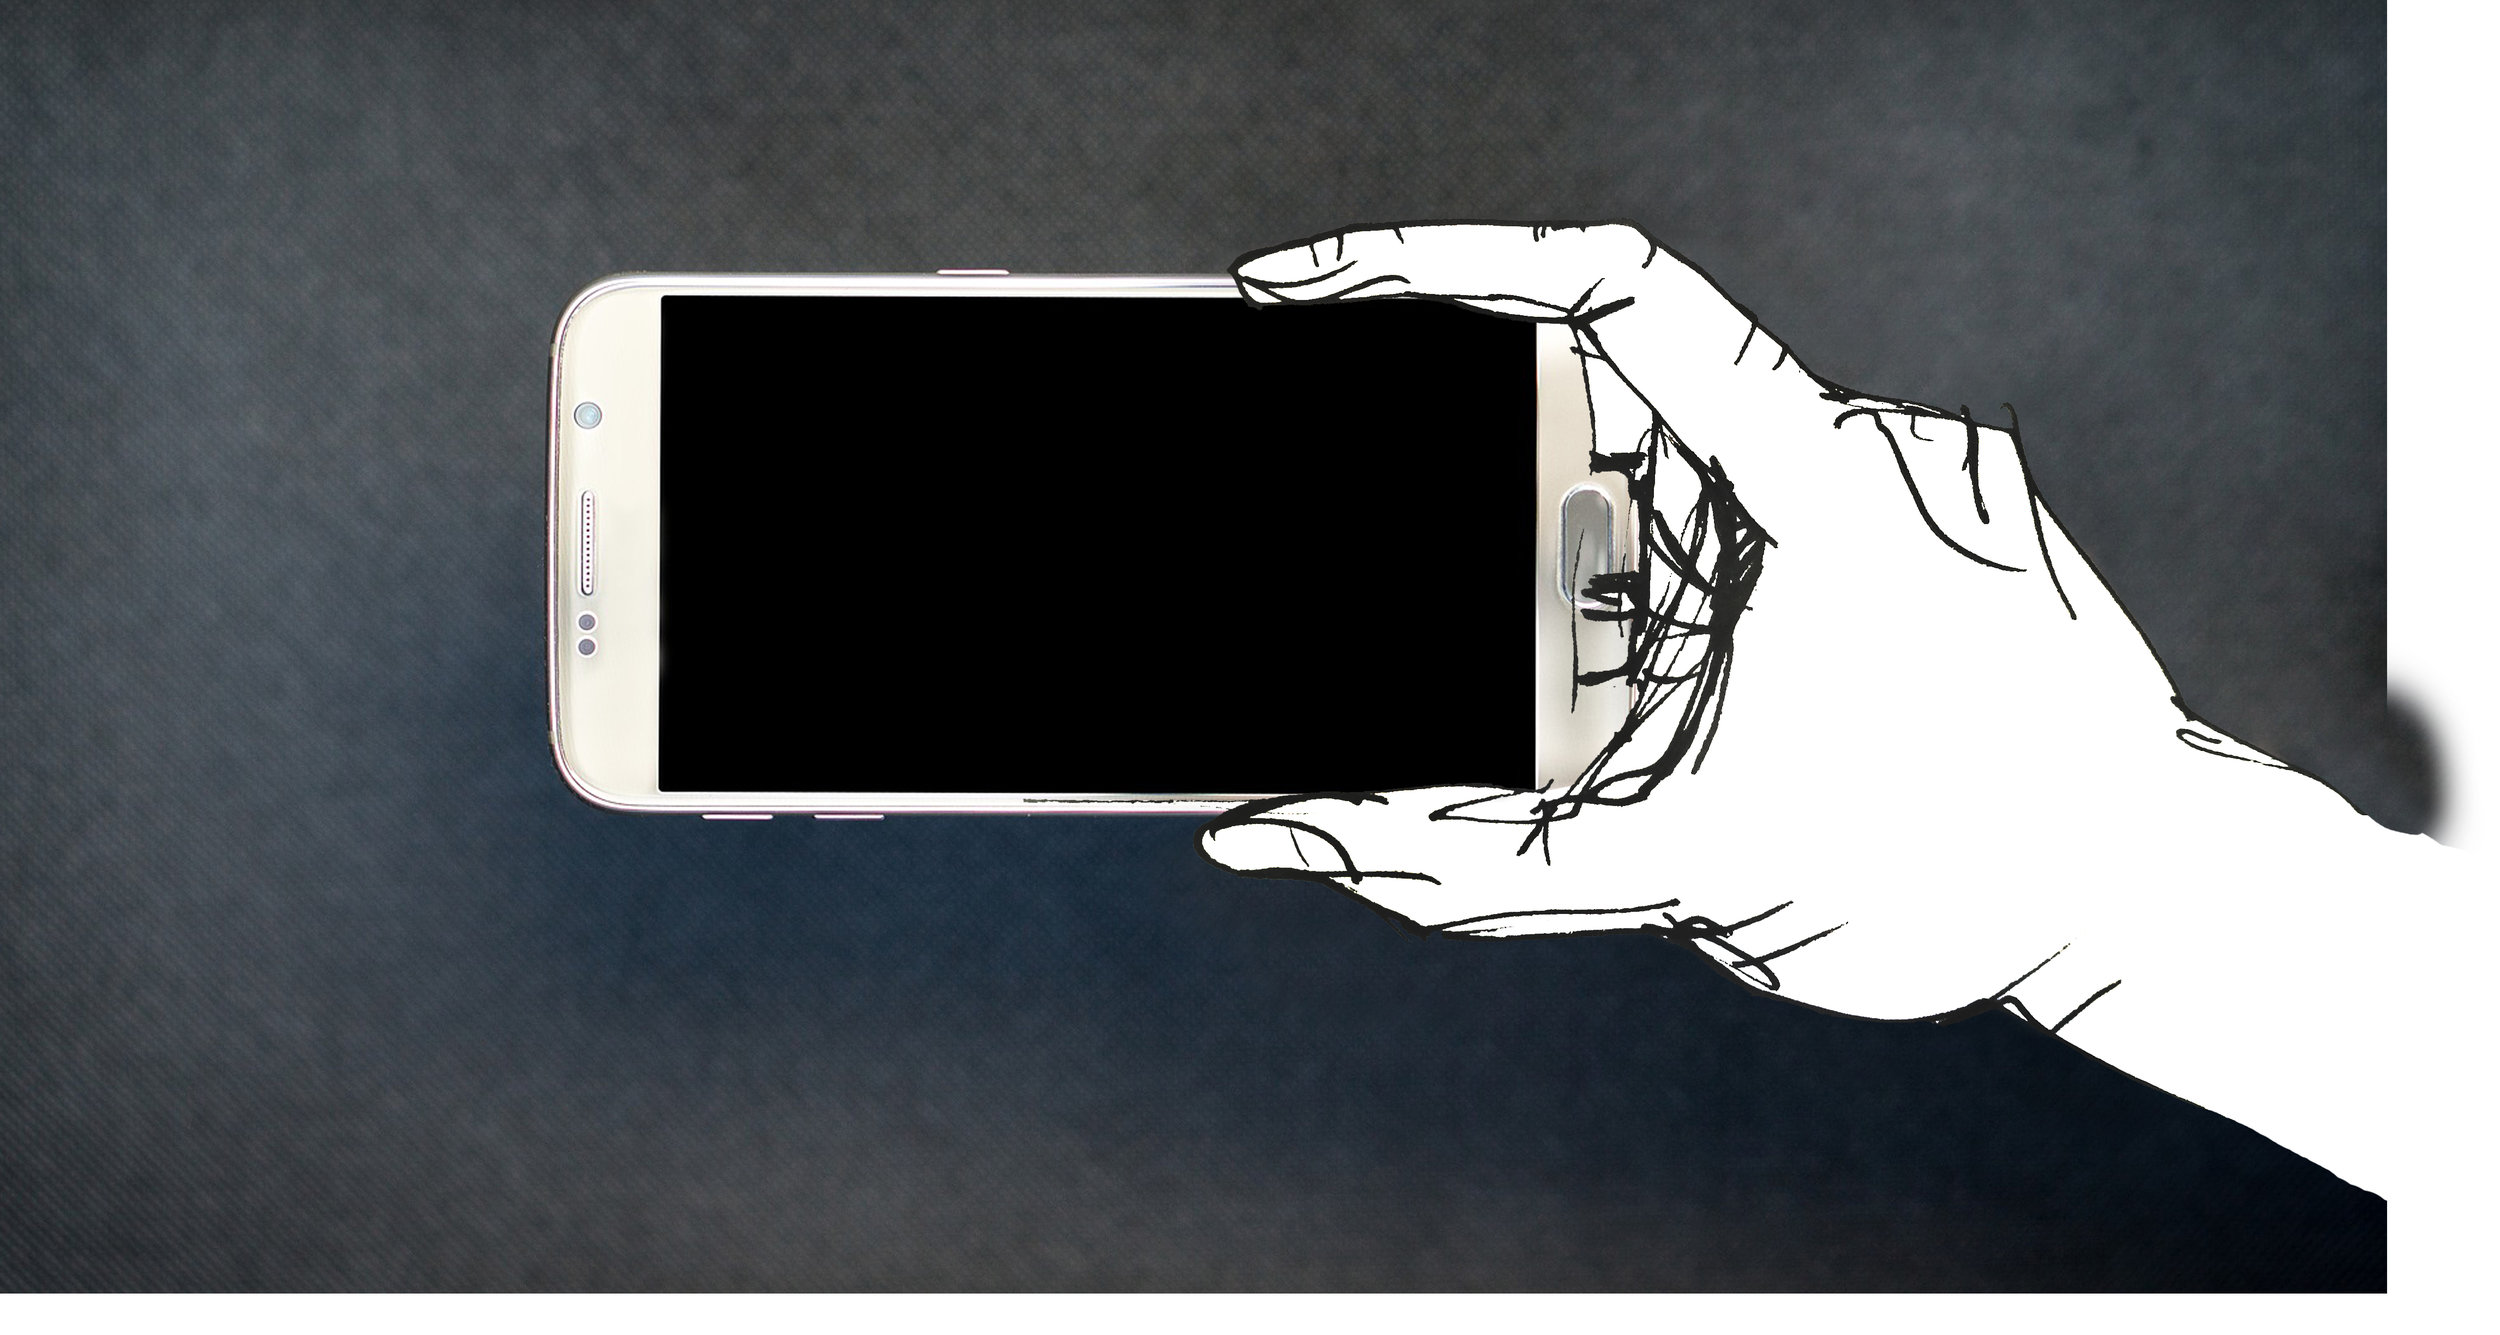 lauri mobile hand 1.jpg